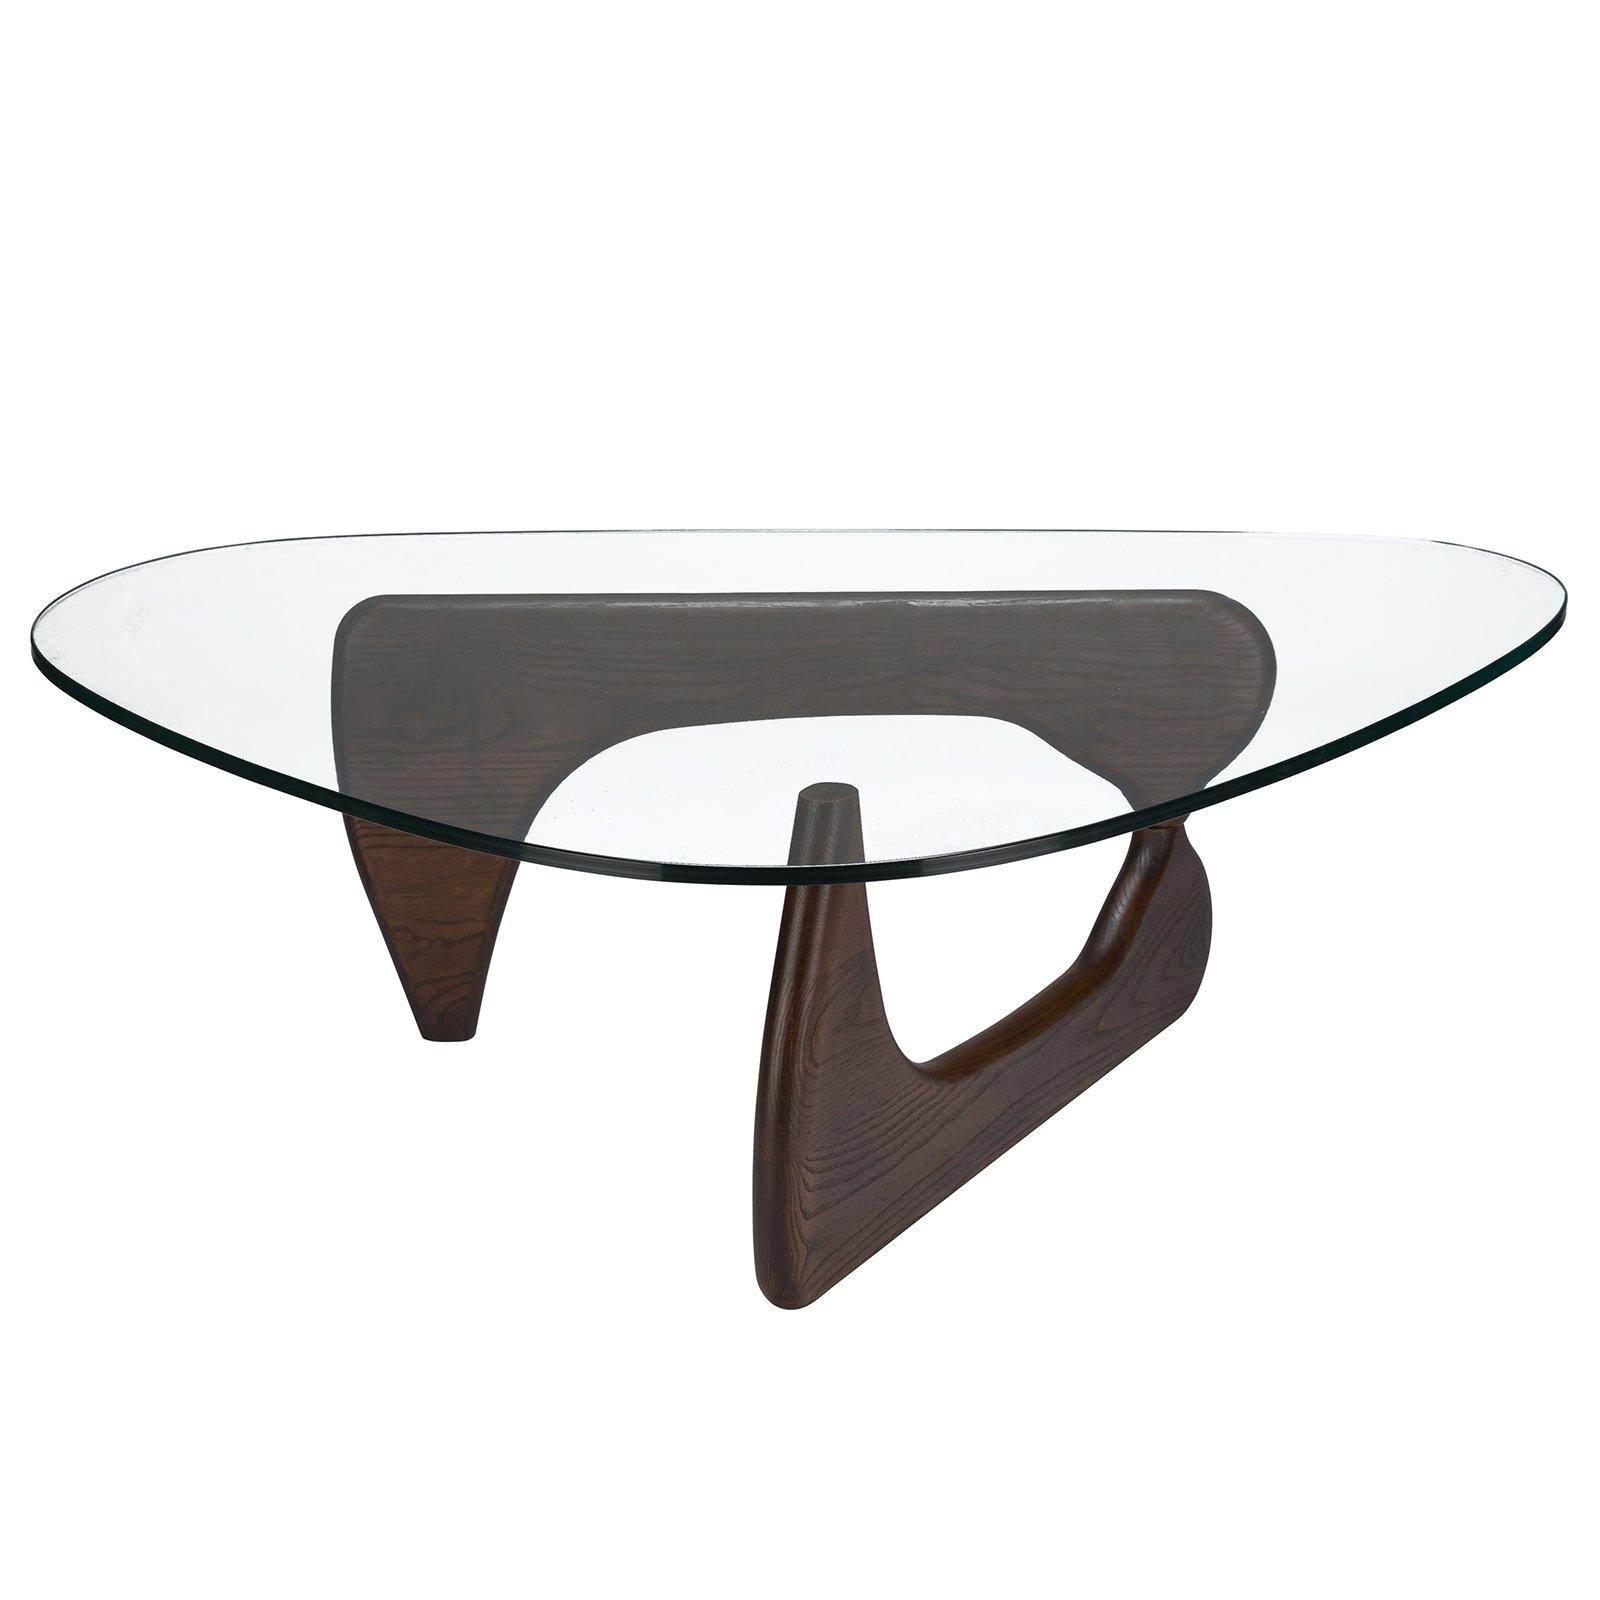 Poly and Bark Isamu Noguchi Style Coffee Table, Dark Walnut